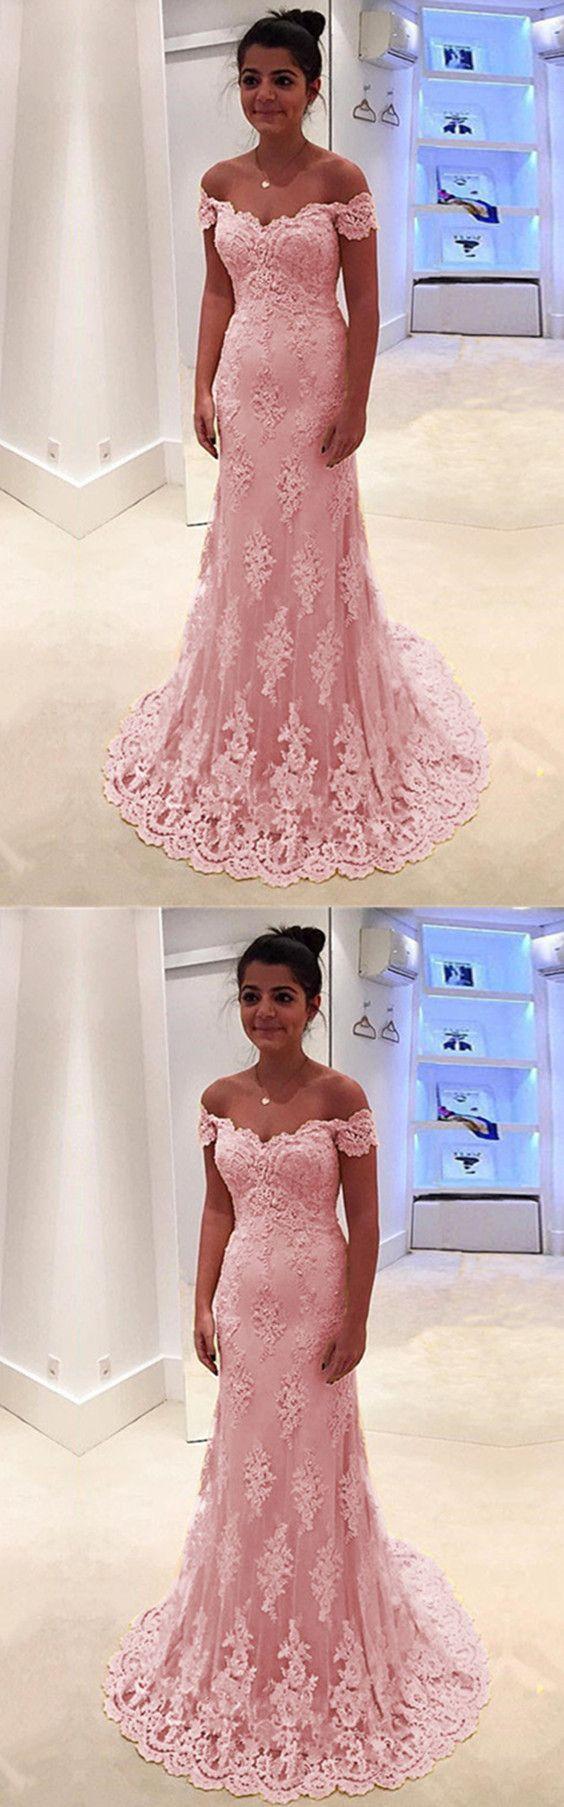 Baby pink lace prom dresses mermaid vneck offtheshoulder evening